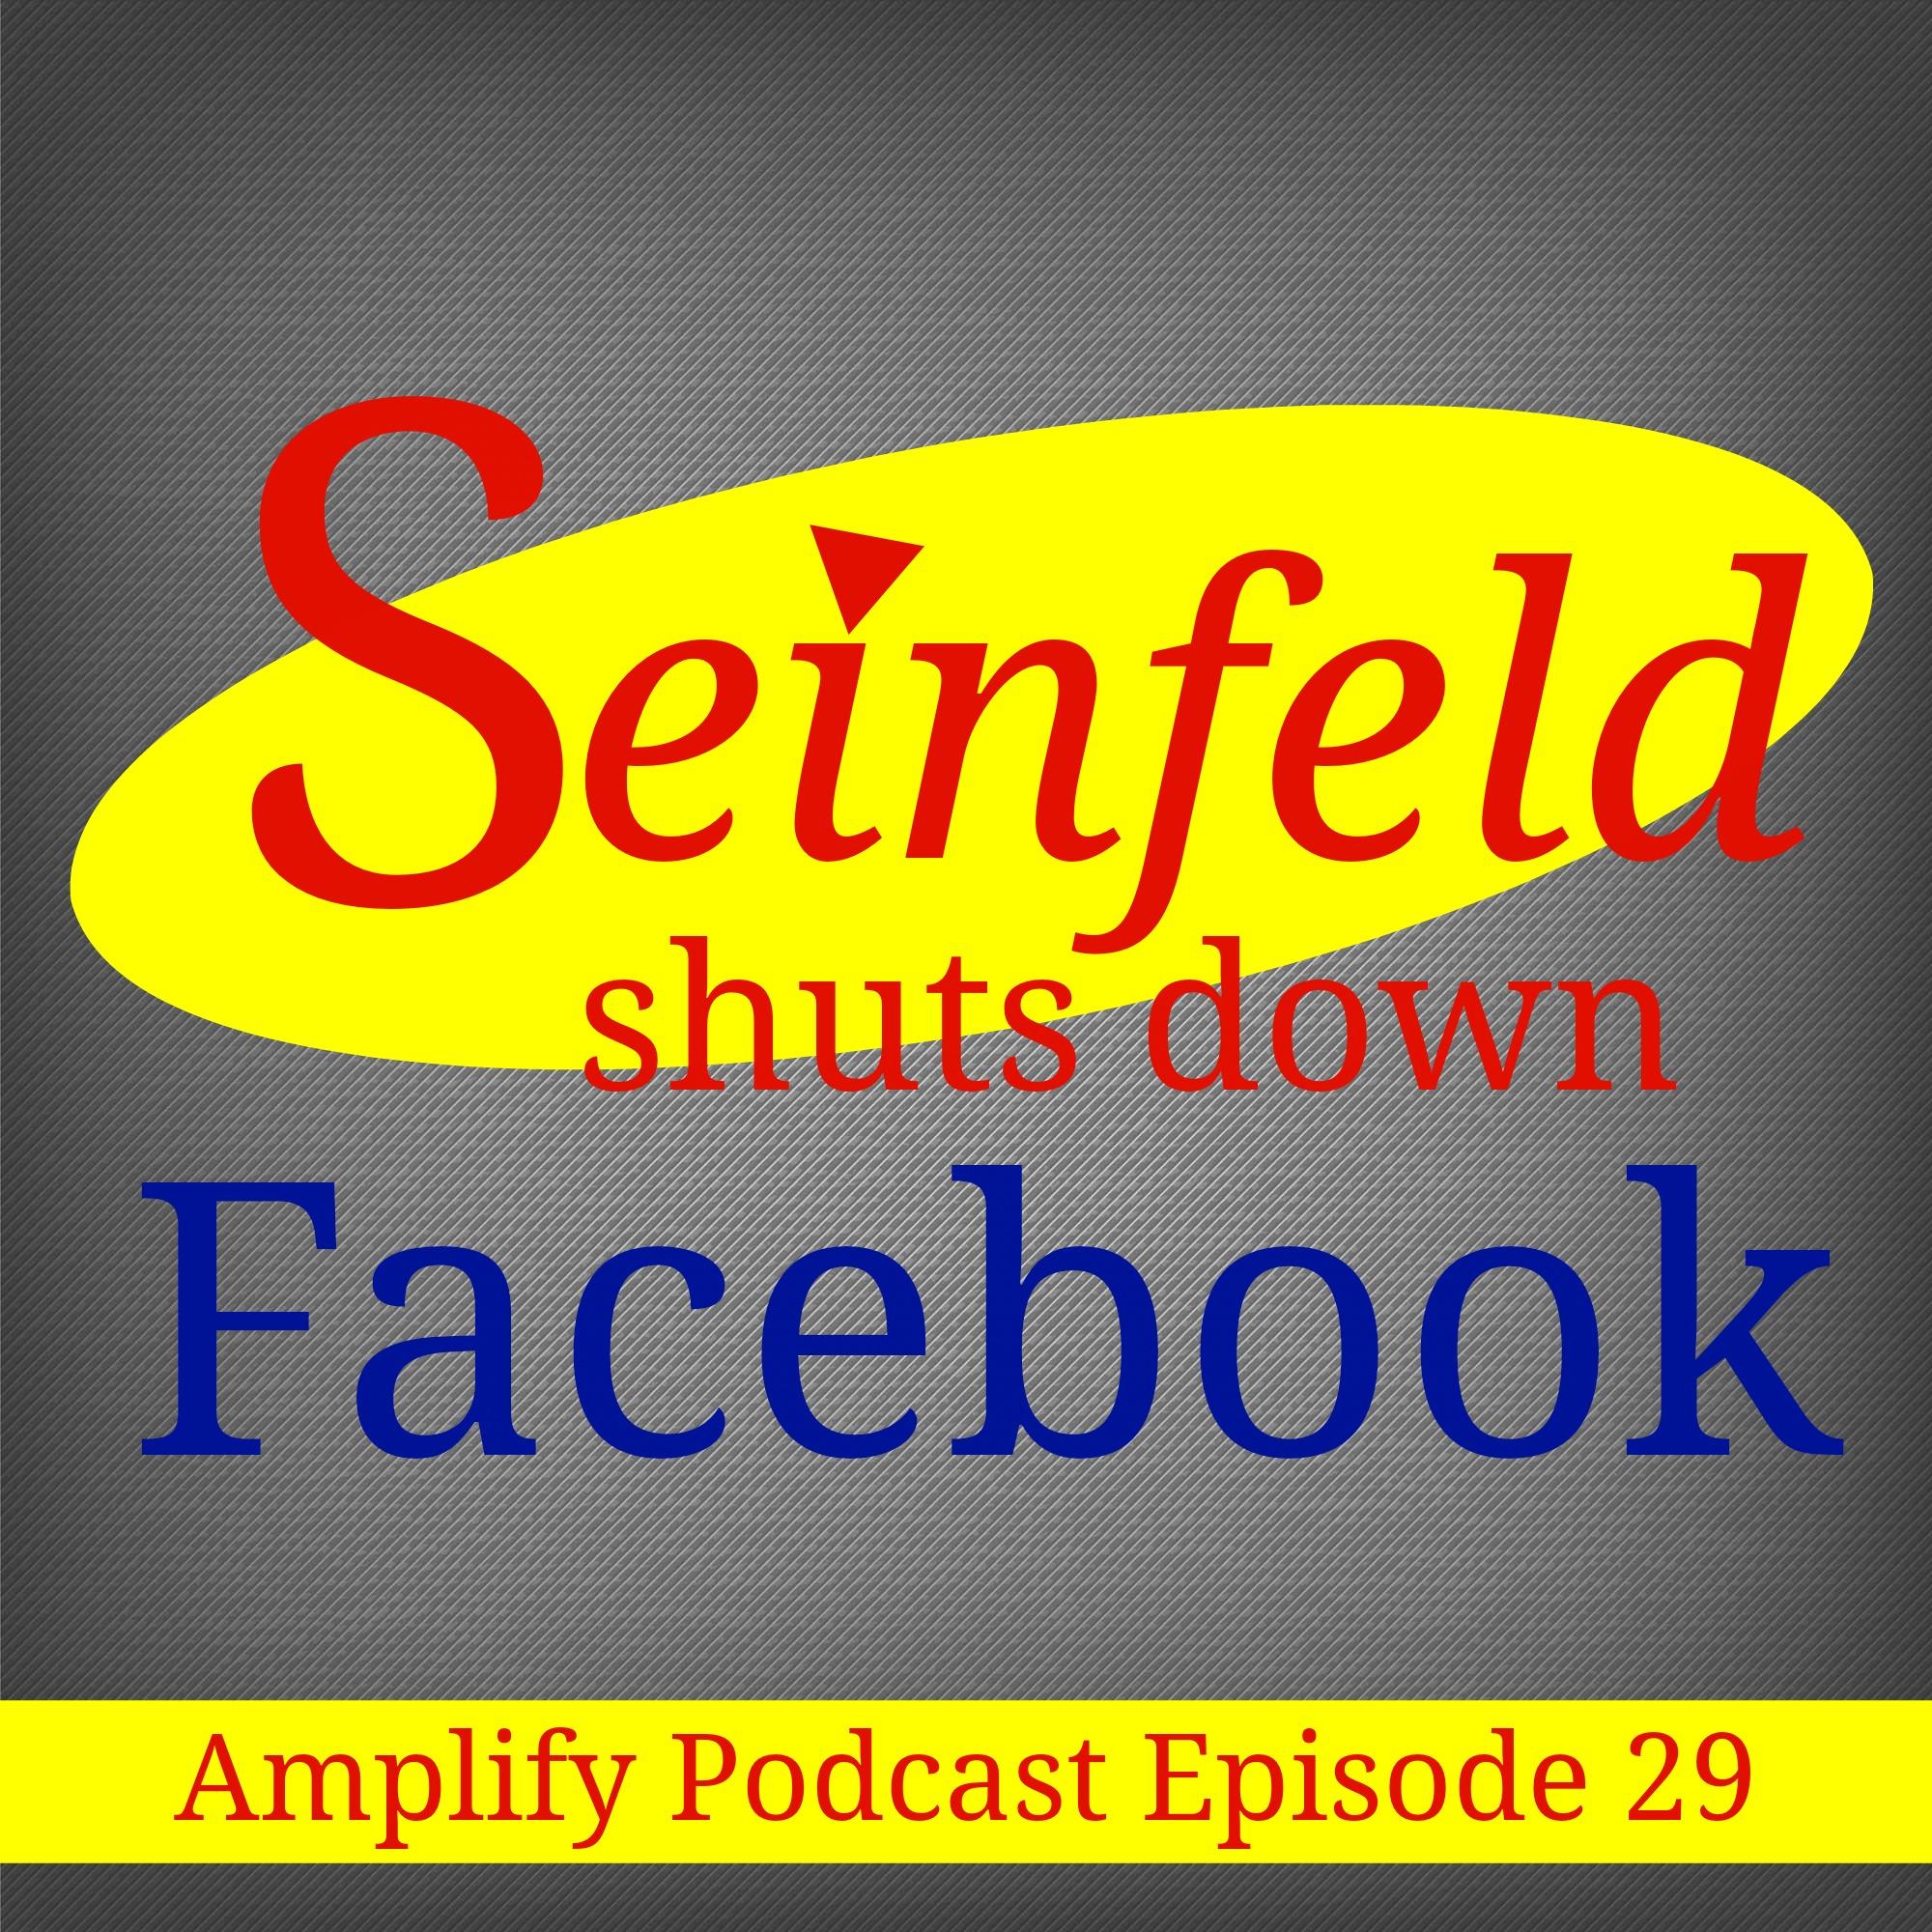 Seinfeld Shuts Down Facebook!